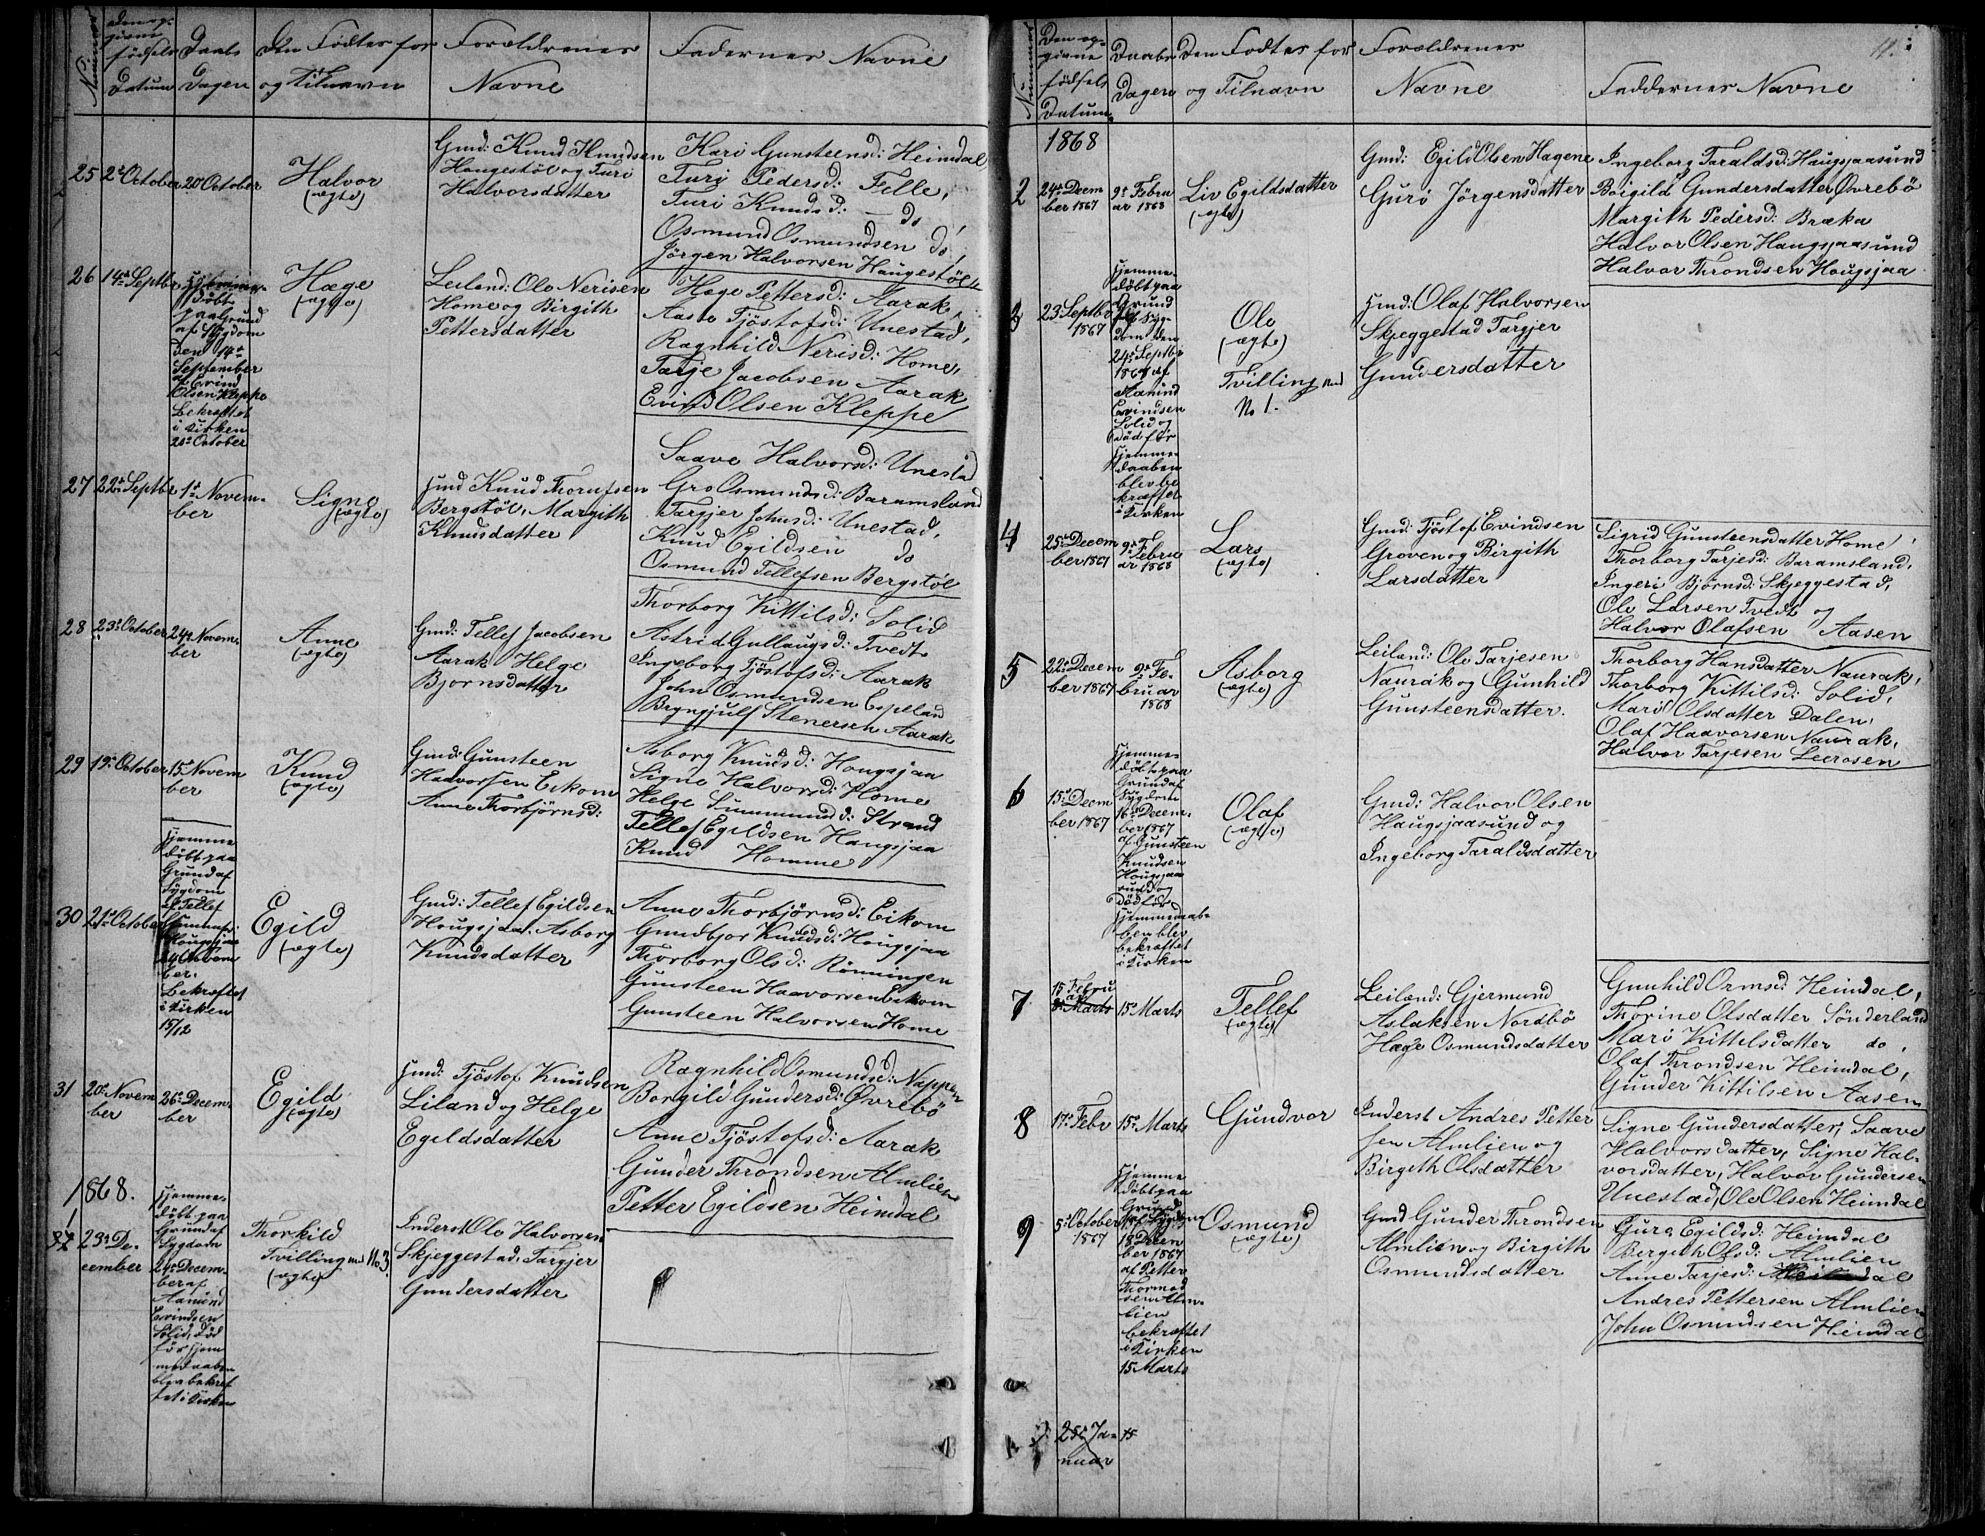 SAKO, Nissedal kirkebøker, G/Gb/L0002: Klokkerbok nr. II 2, 1863-1892, s. 11